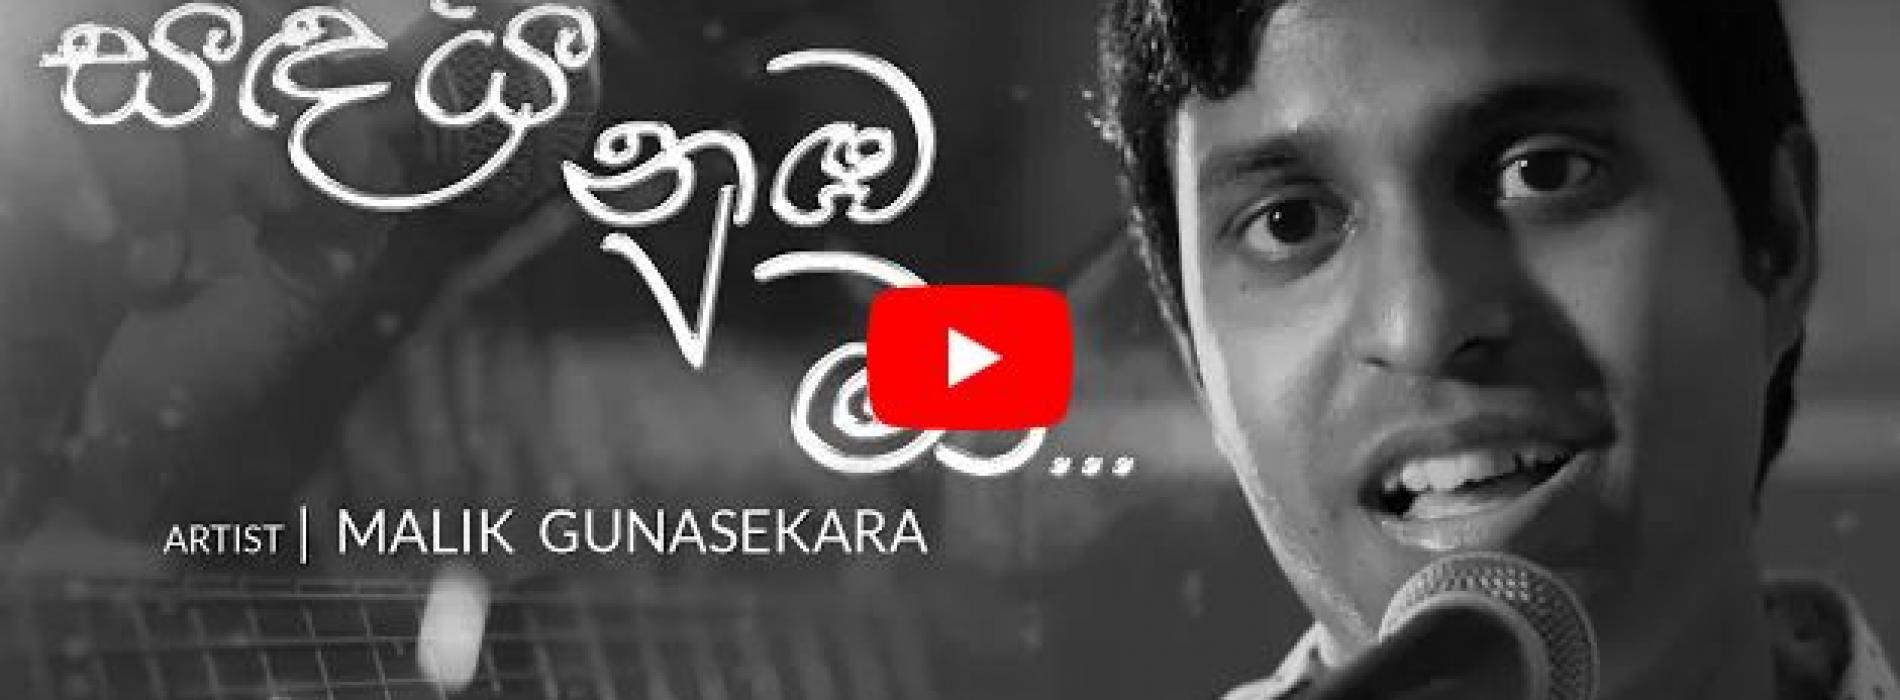 New Music : Malik Gunasekara – Sadai Nuba Ma සඳයි නුඹ මා (Official Music Video)